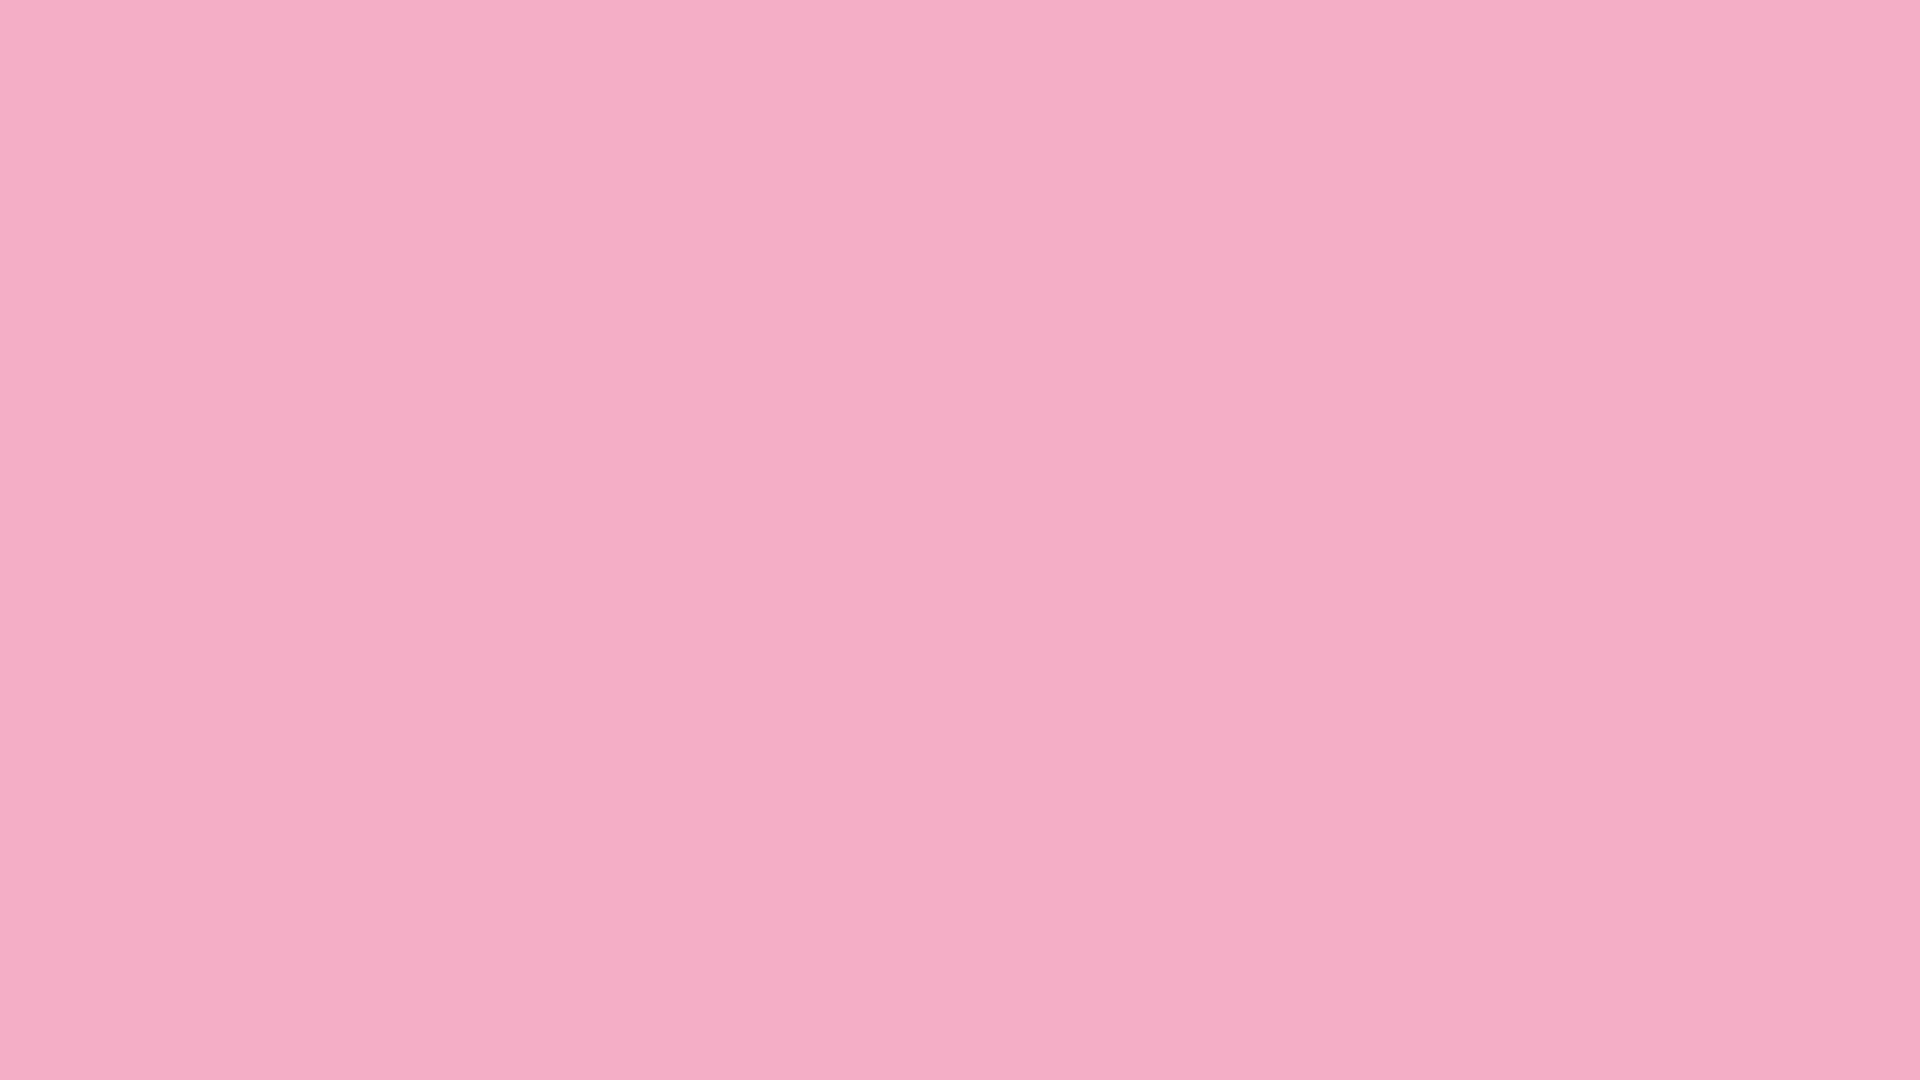 1920x1080 Nadeshiko Pink Solid Color Background